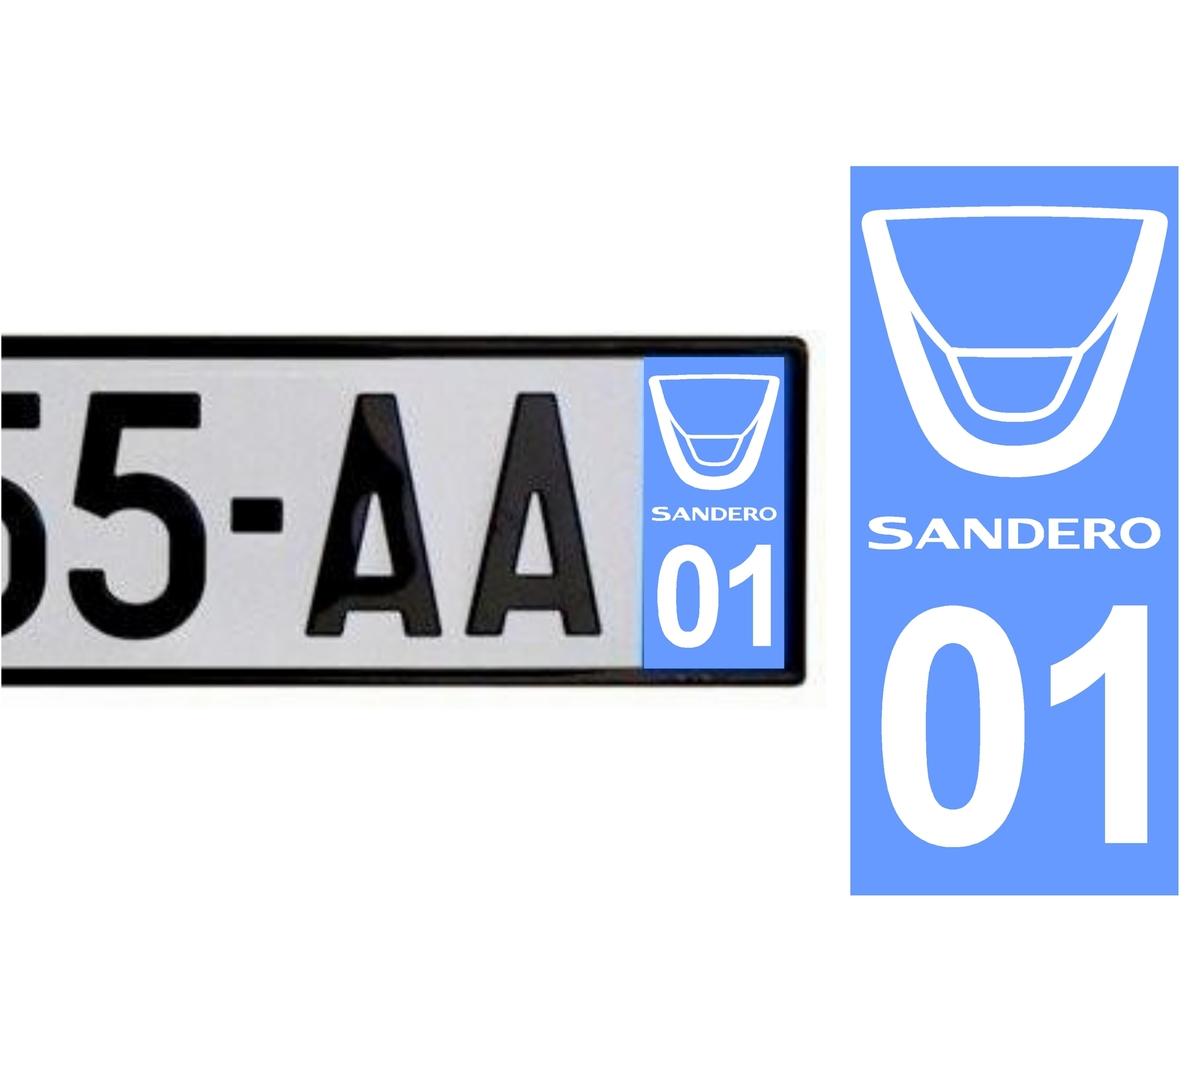 stickers-dacia-ref45-aventure-duster-4x4-renault-stickers-autocollant-logan-sandero-decoration-plaque-immatriculation-adhesive